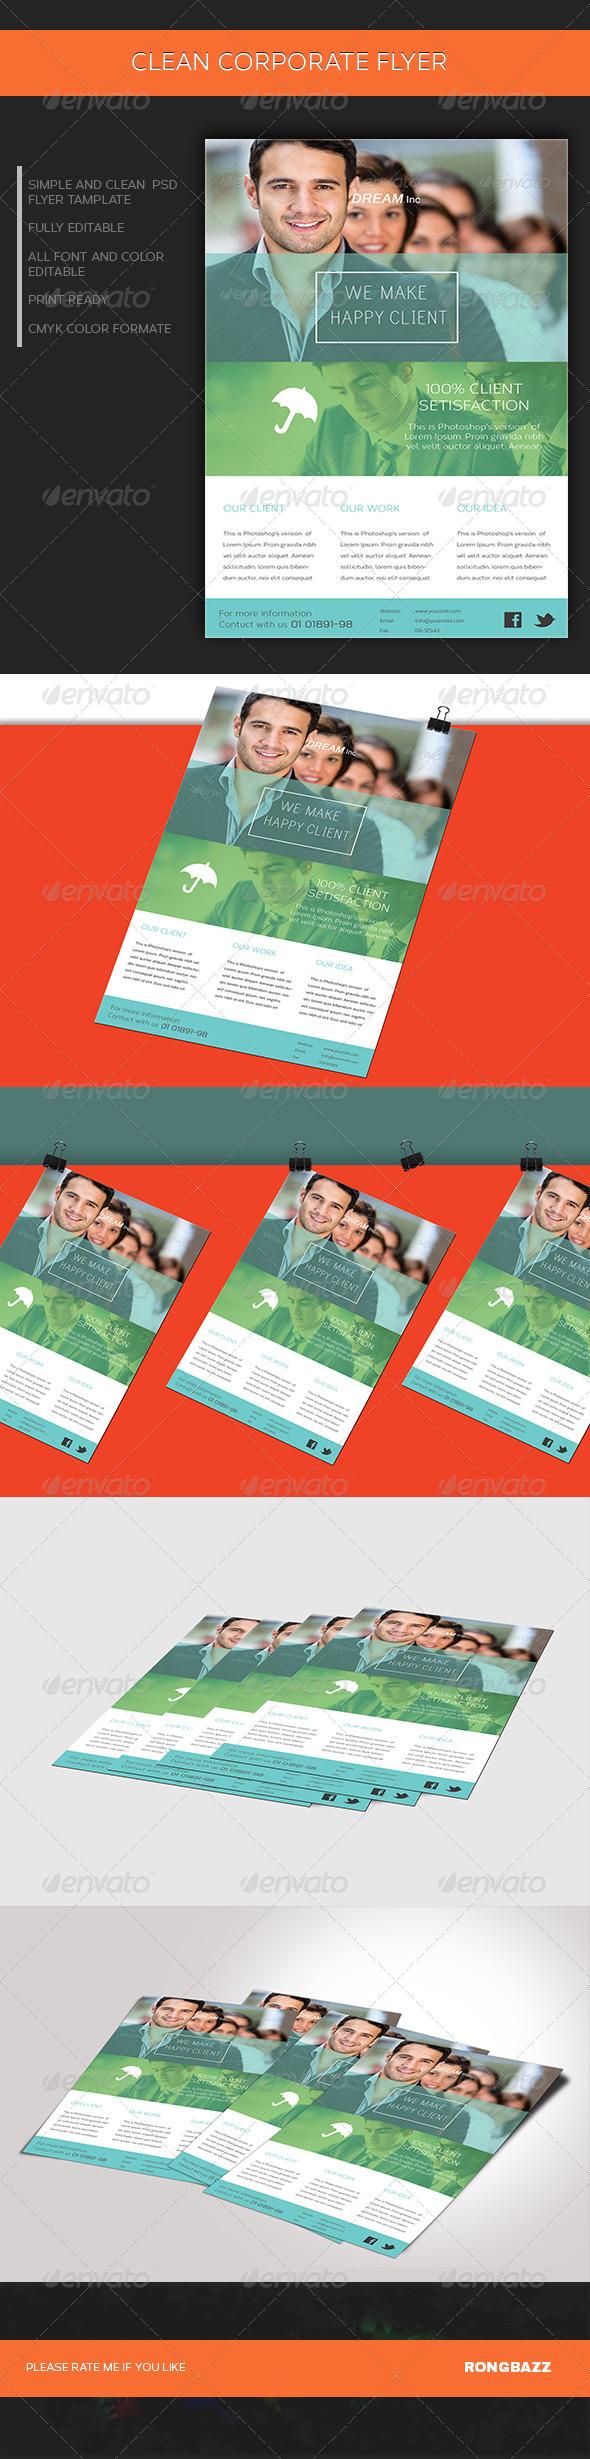 GraphicRiver Clean Corporate Flyer 0.1 6816499